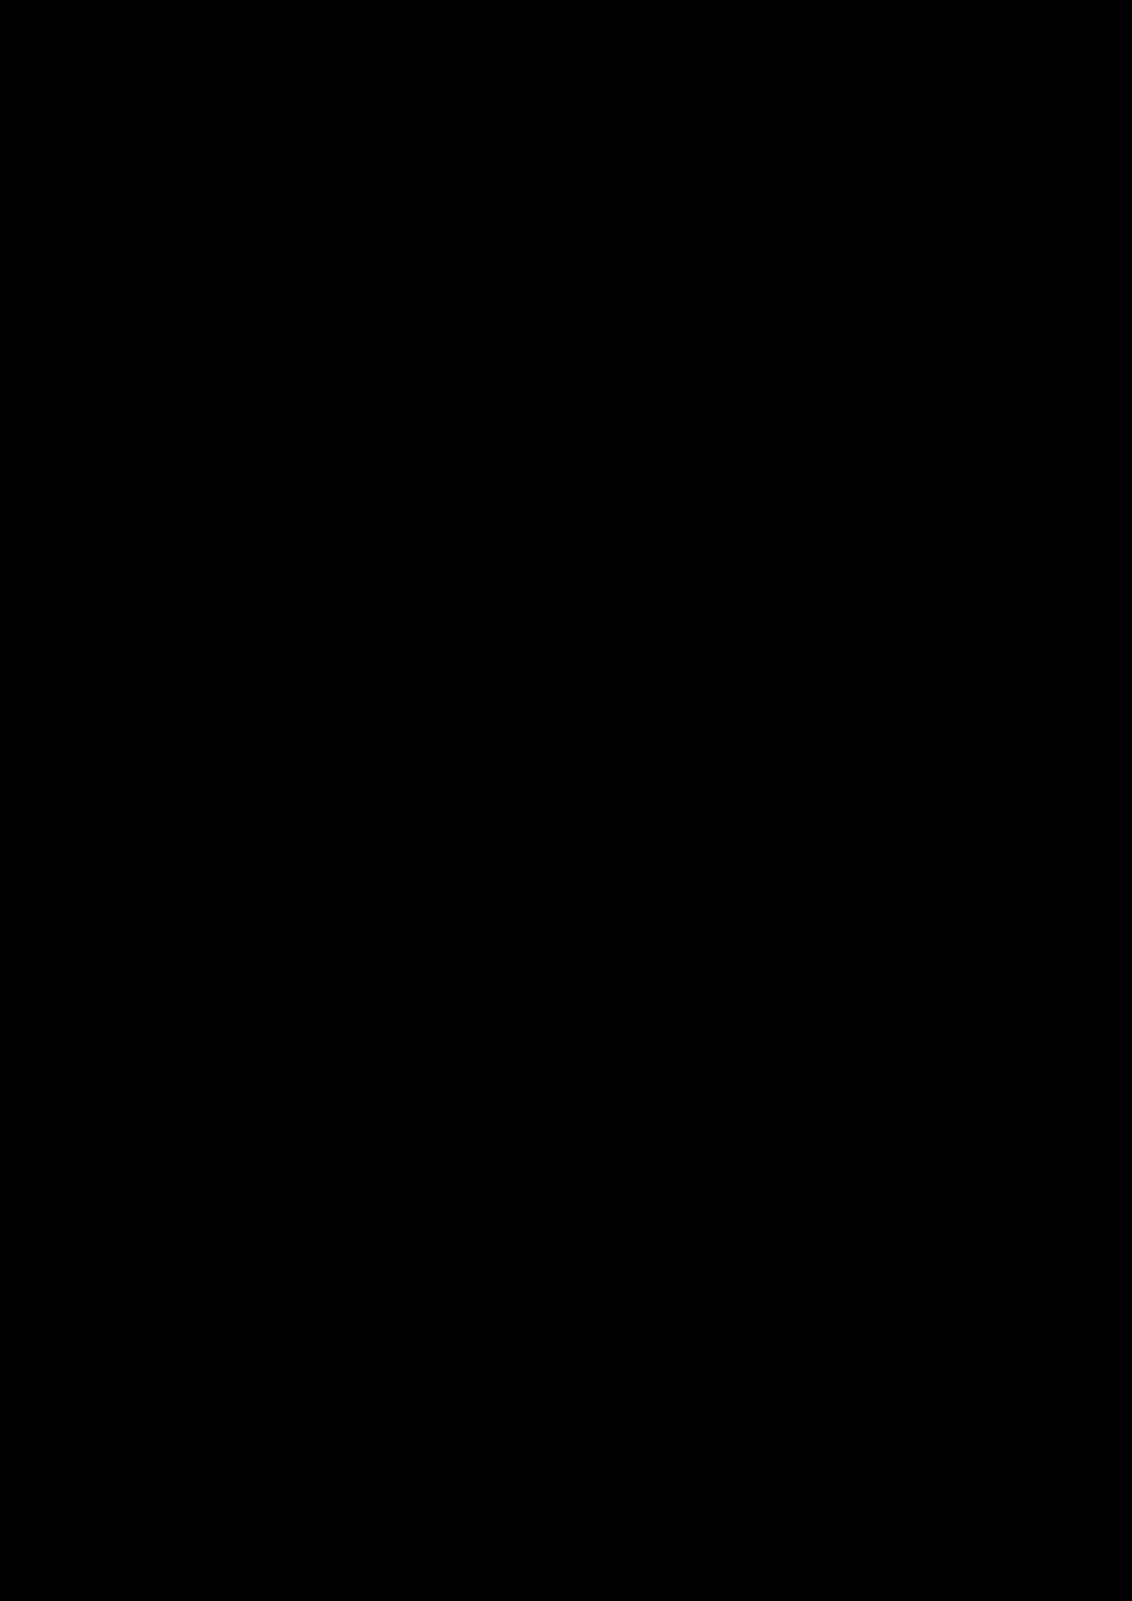 Korolevstvo slez slide, Image 29